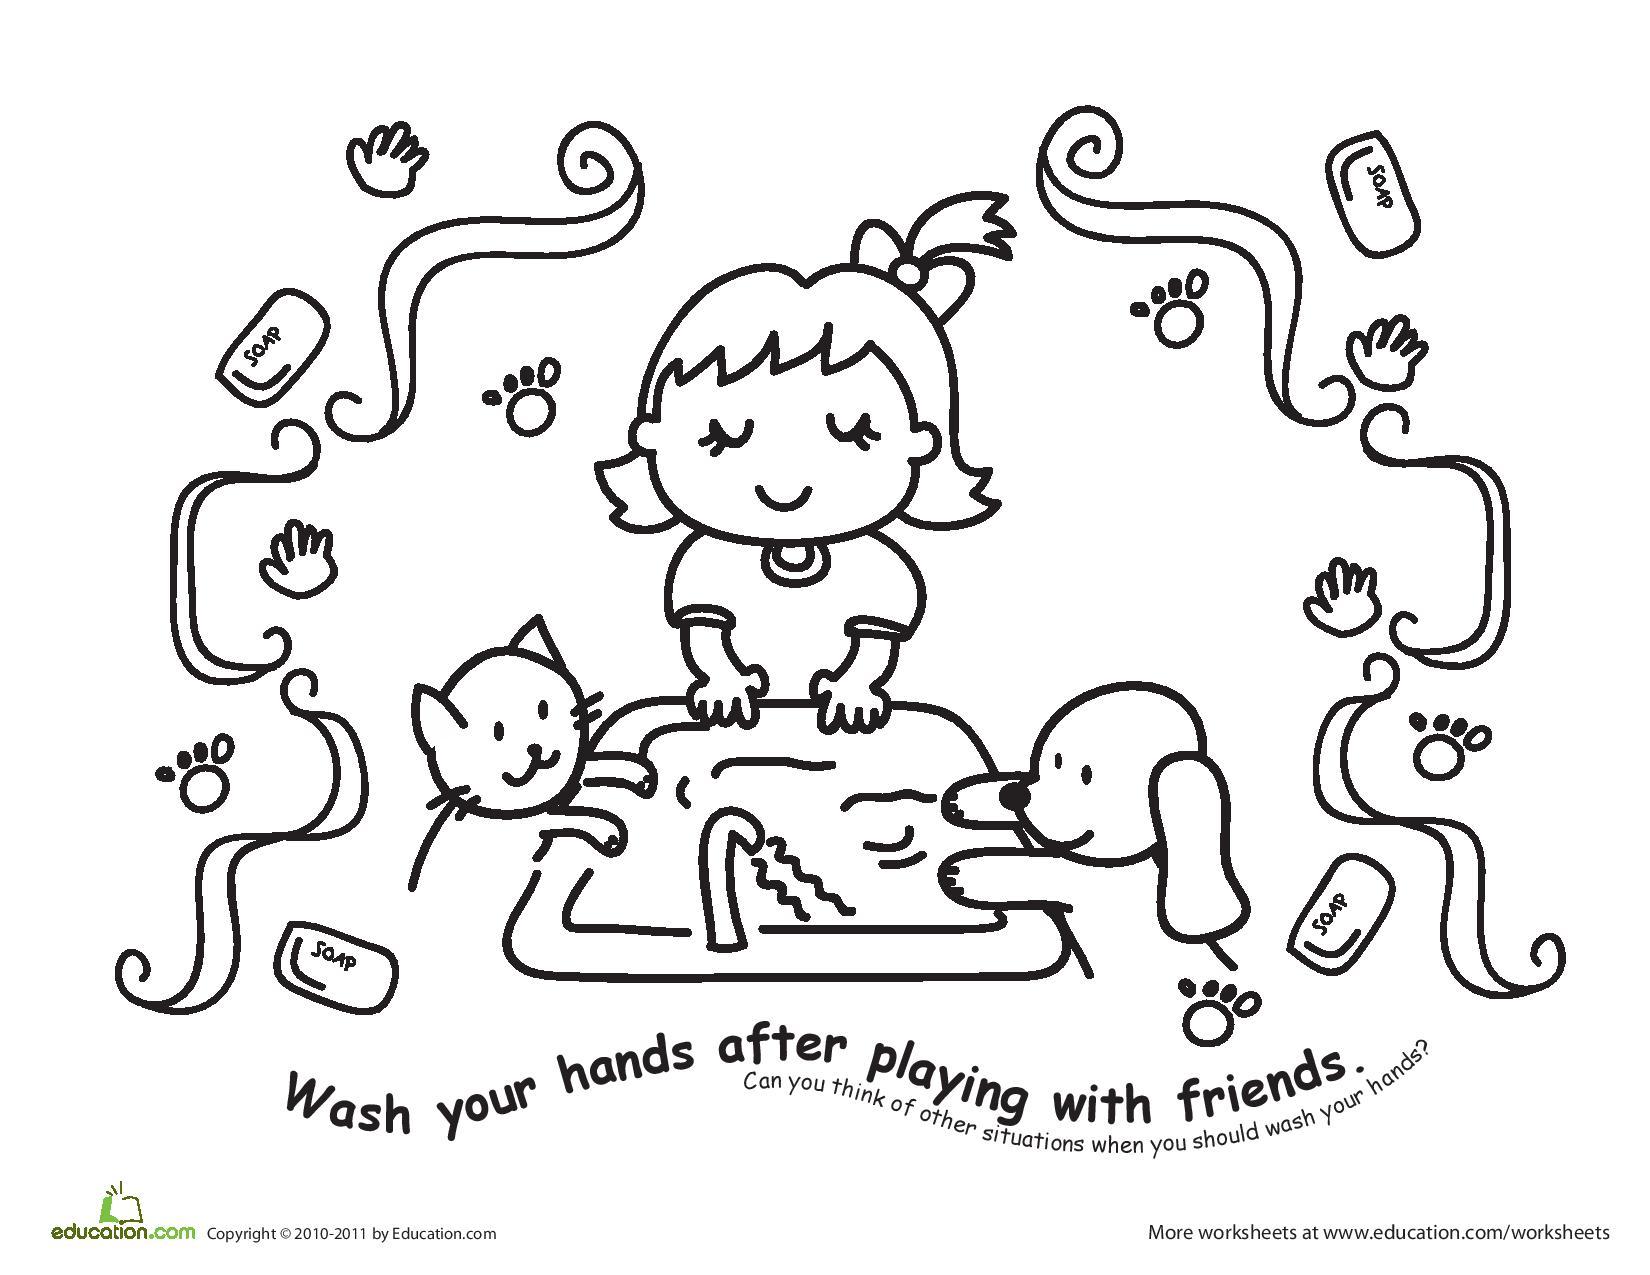 Personal Hygiene Drawing At Getdrawings